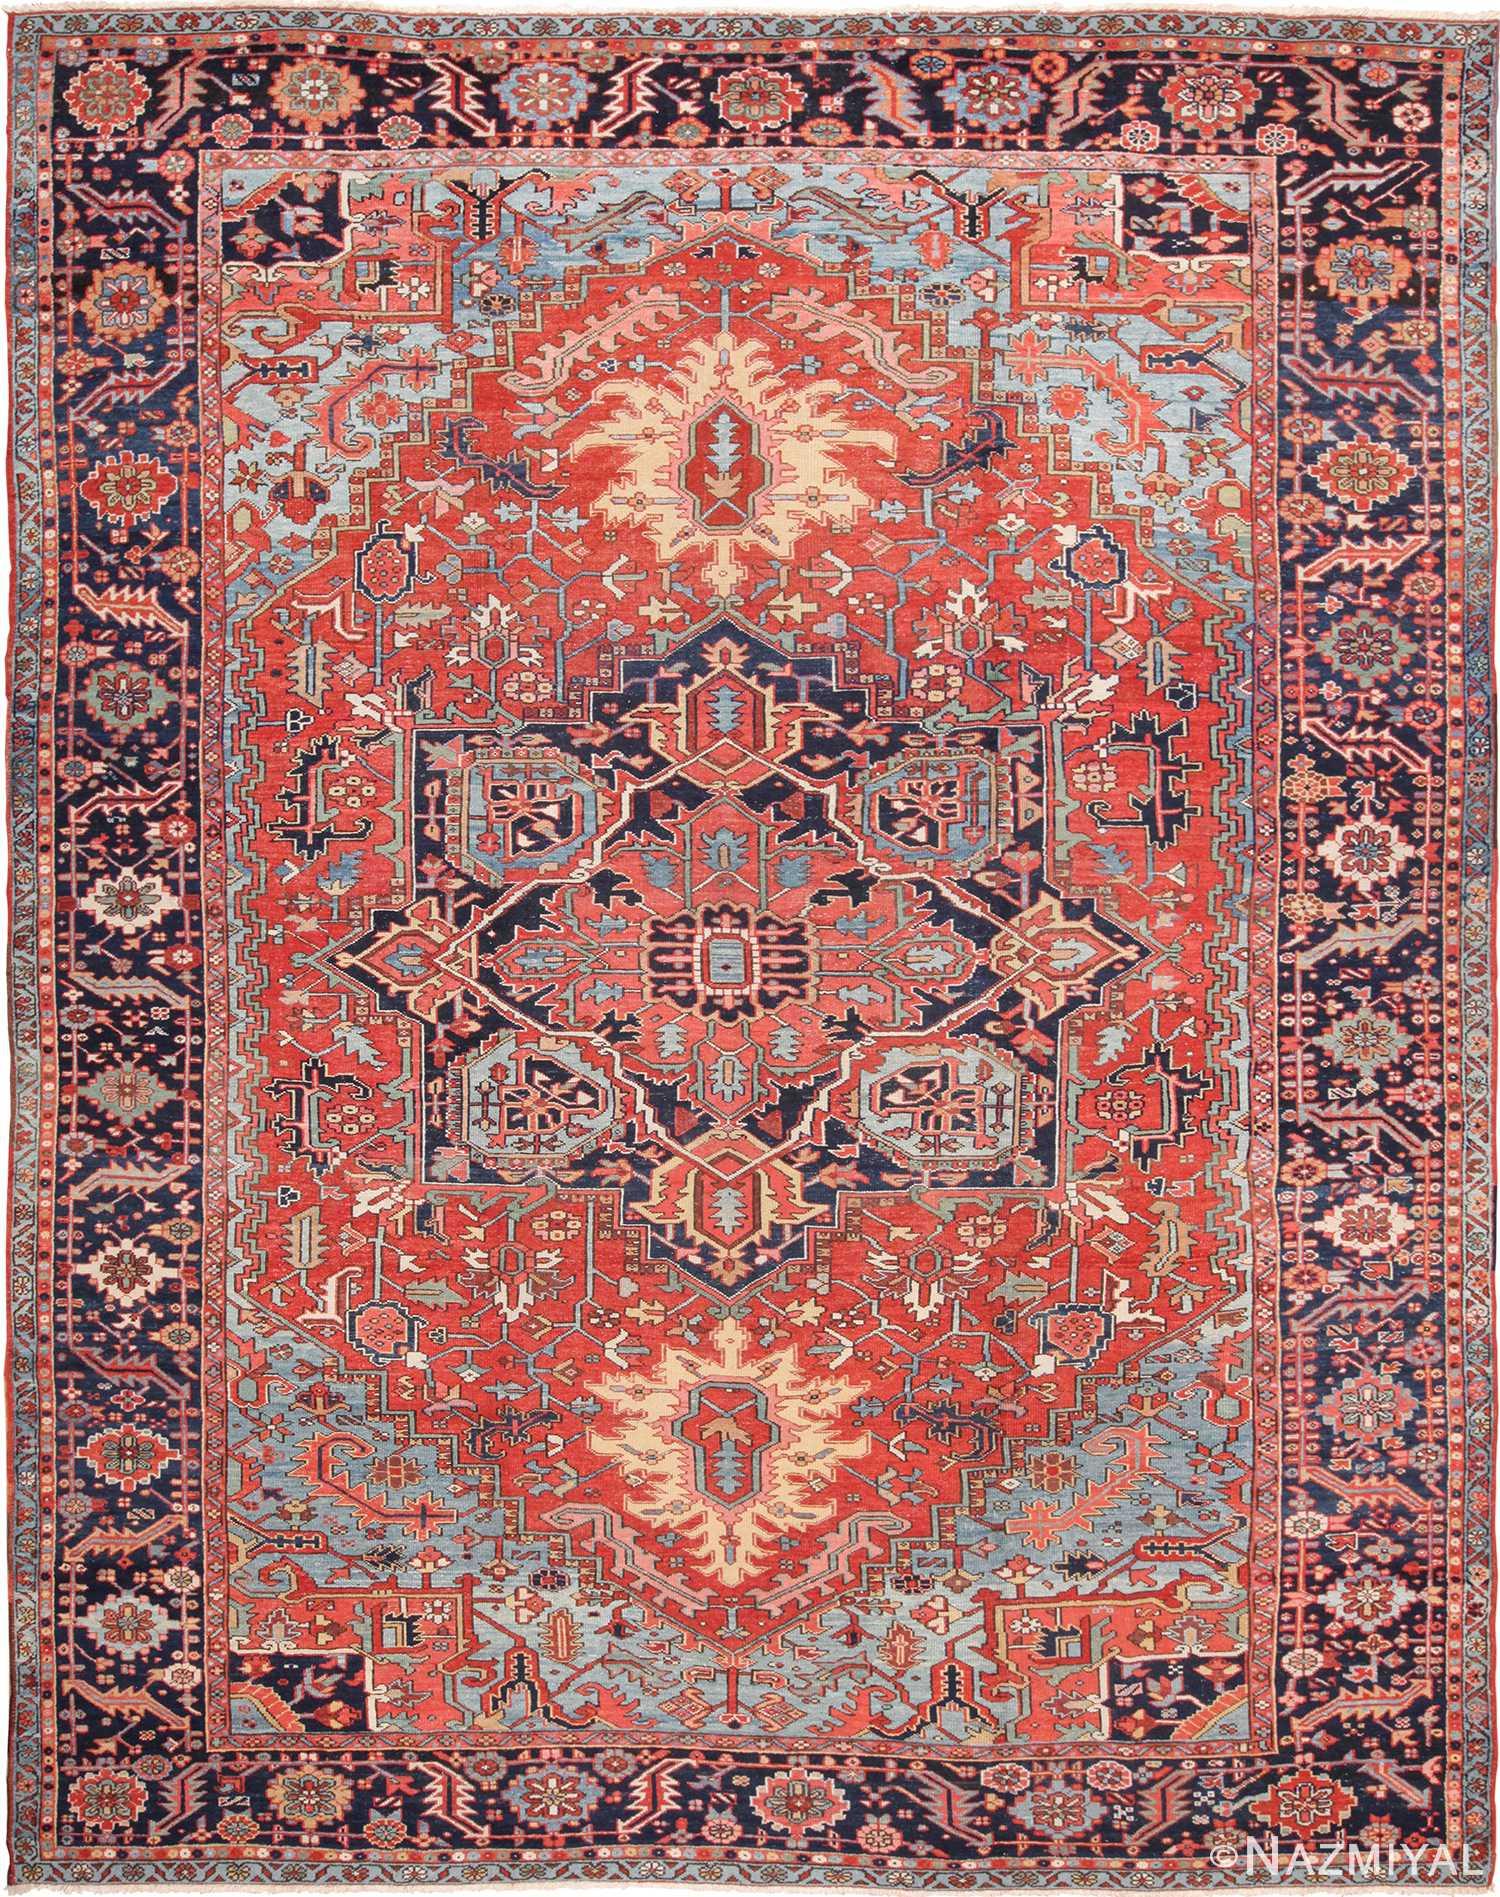 Large Antique Geometric Persian Heriz Rug 49654 by Nazmiyal